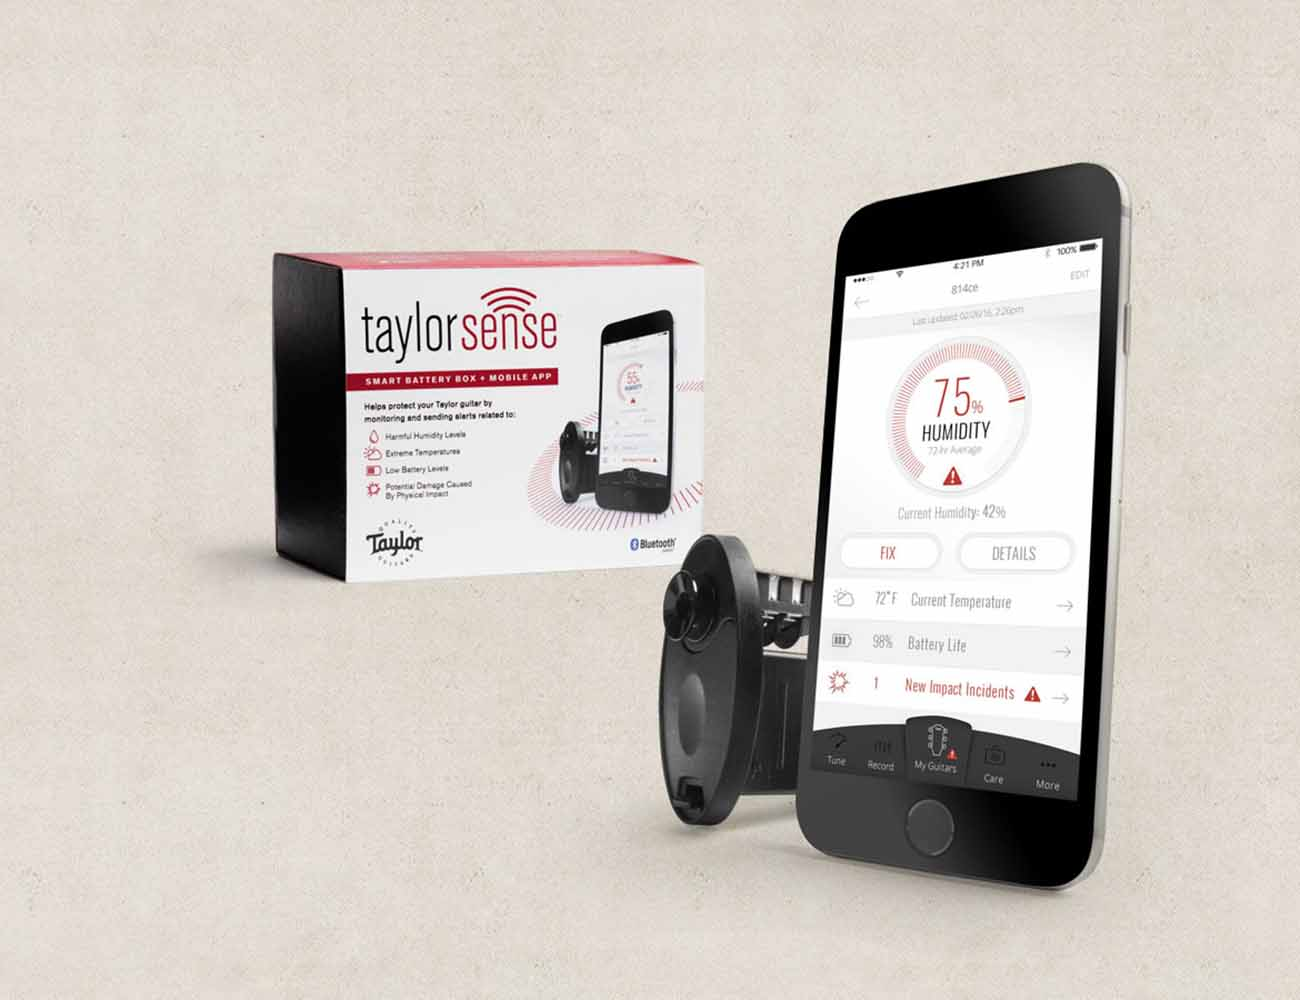 TaylorSense Guitar Health Monitoring System